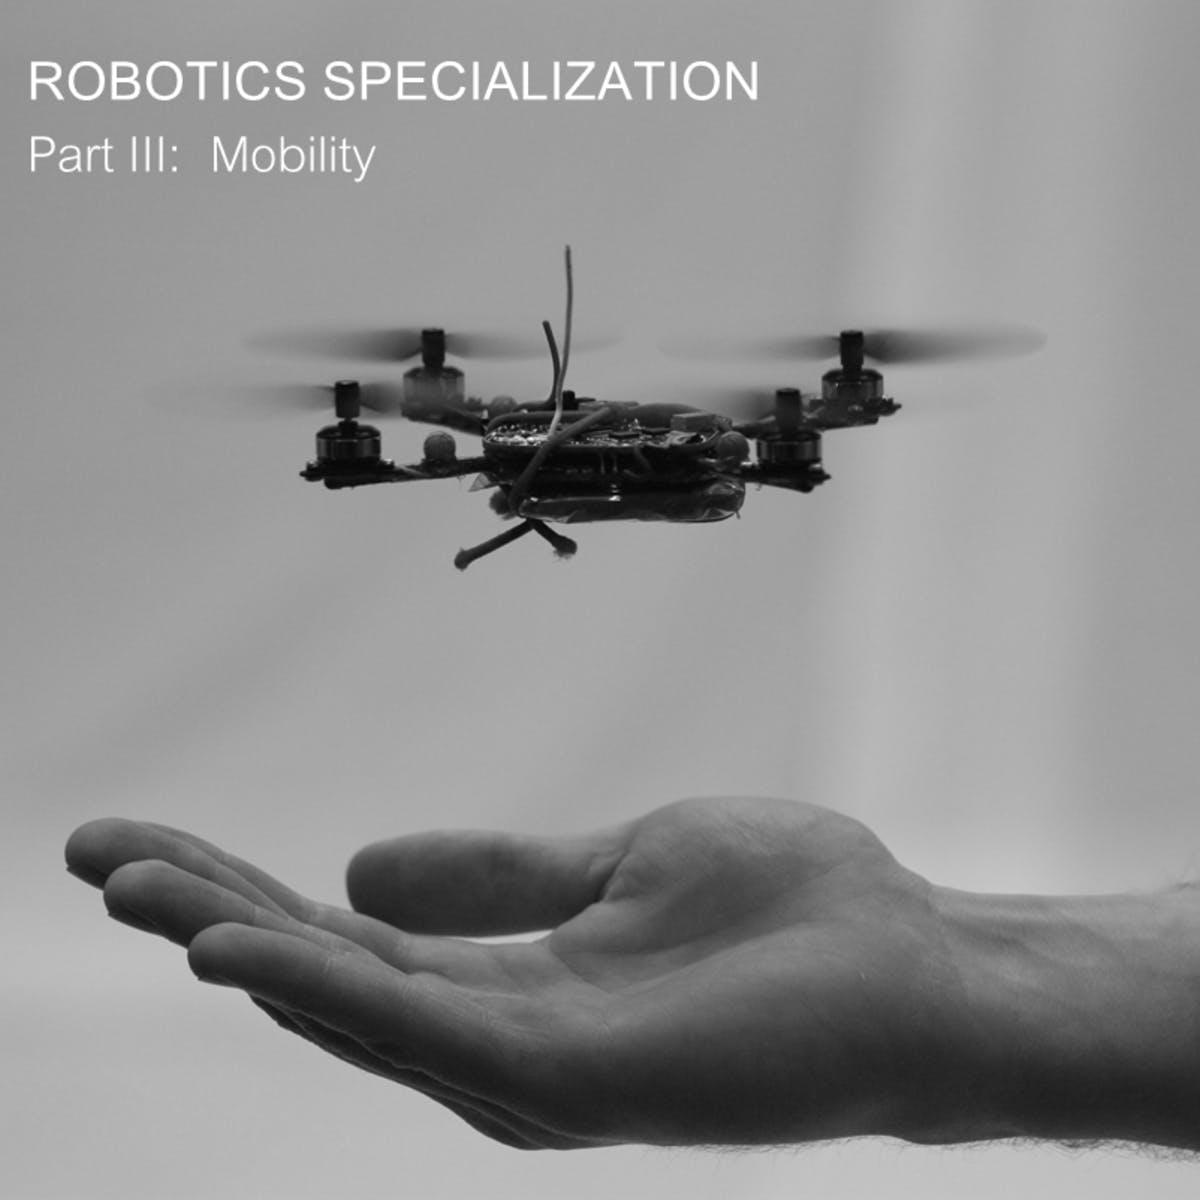 Robotics: Mobility